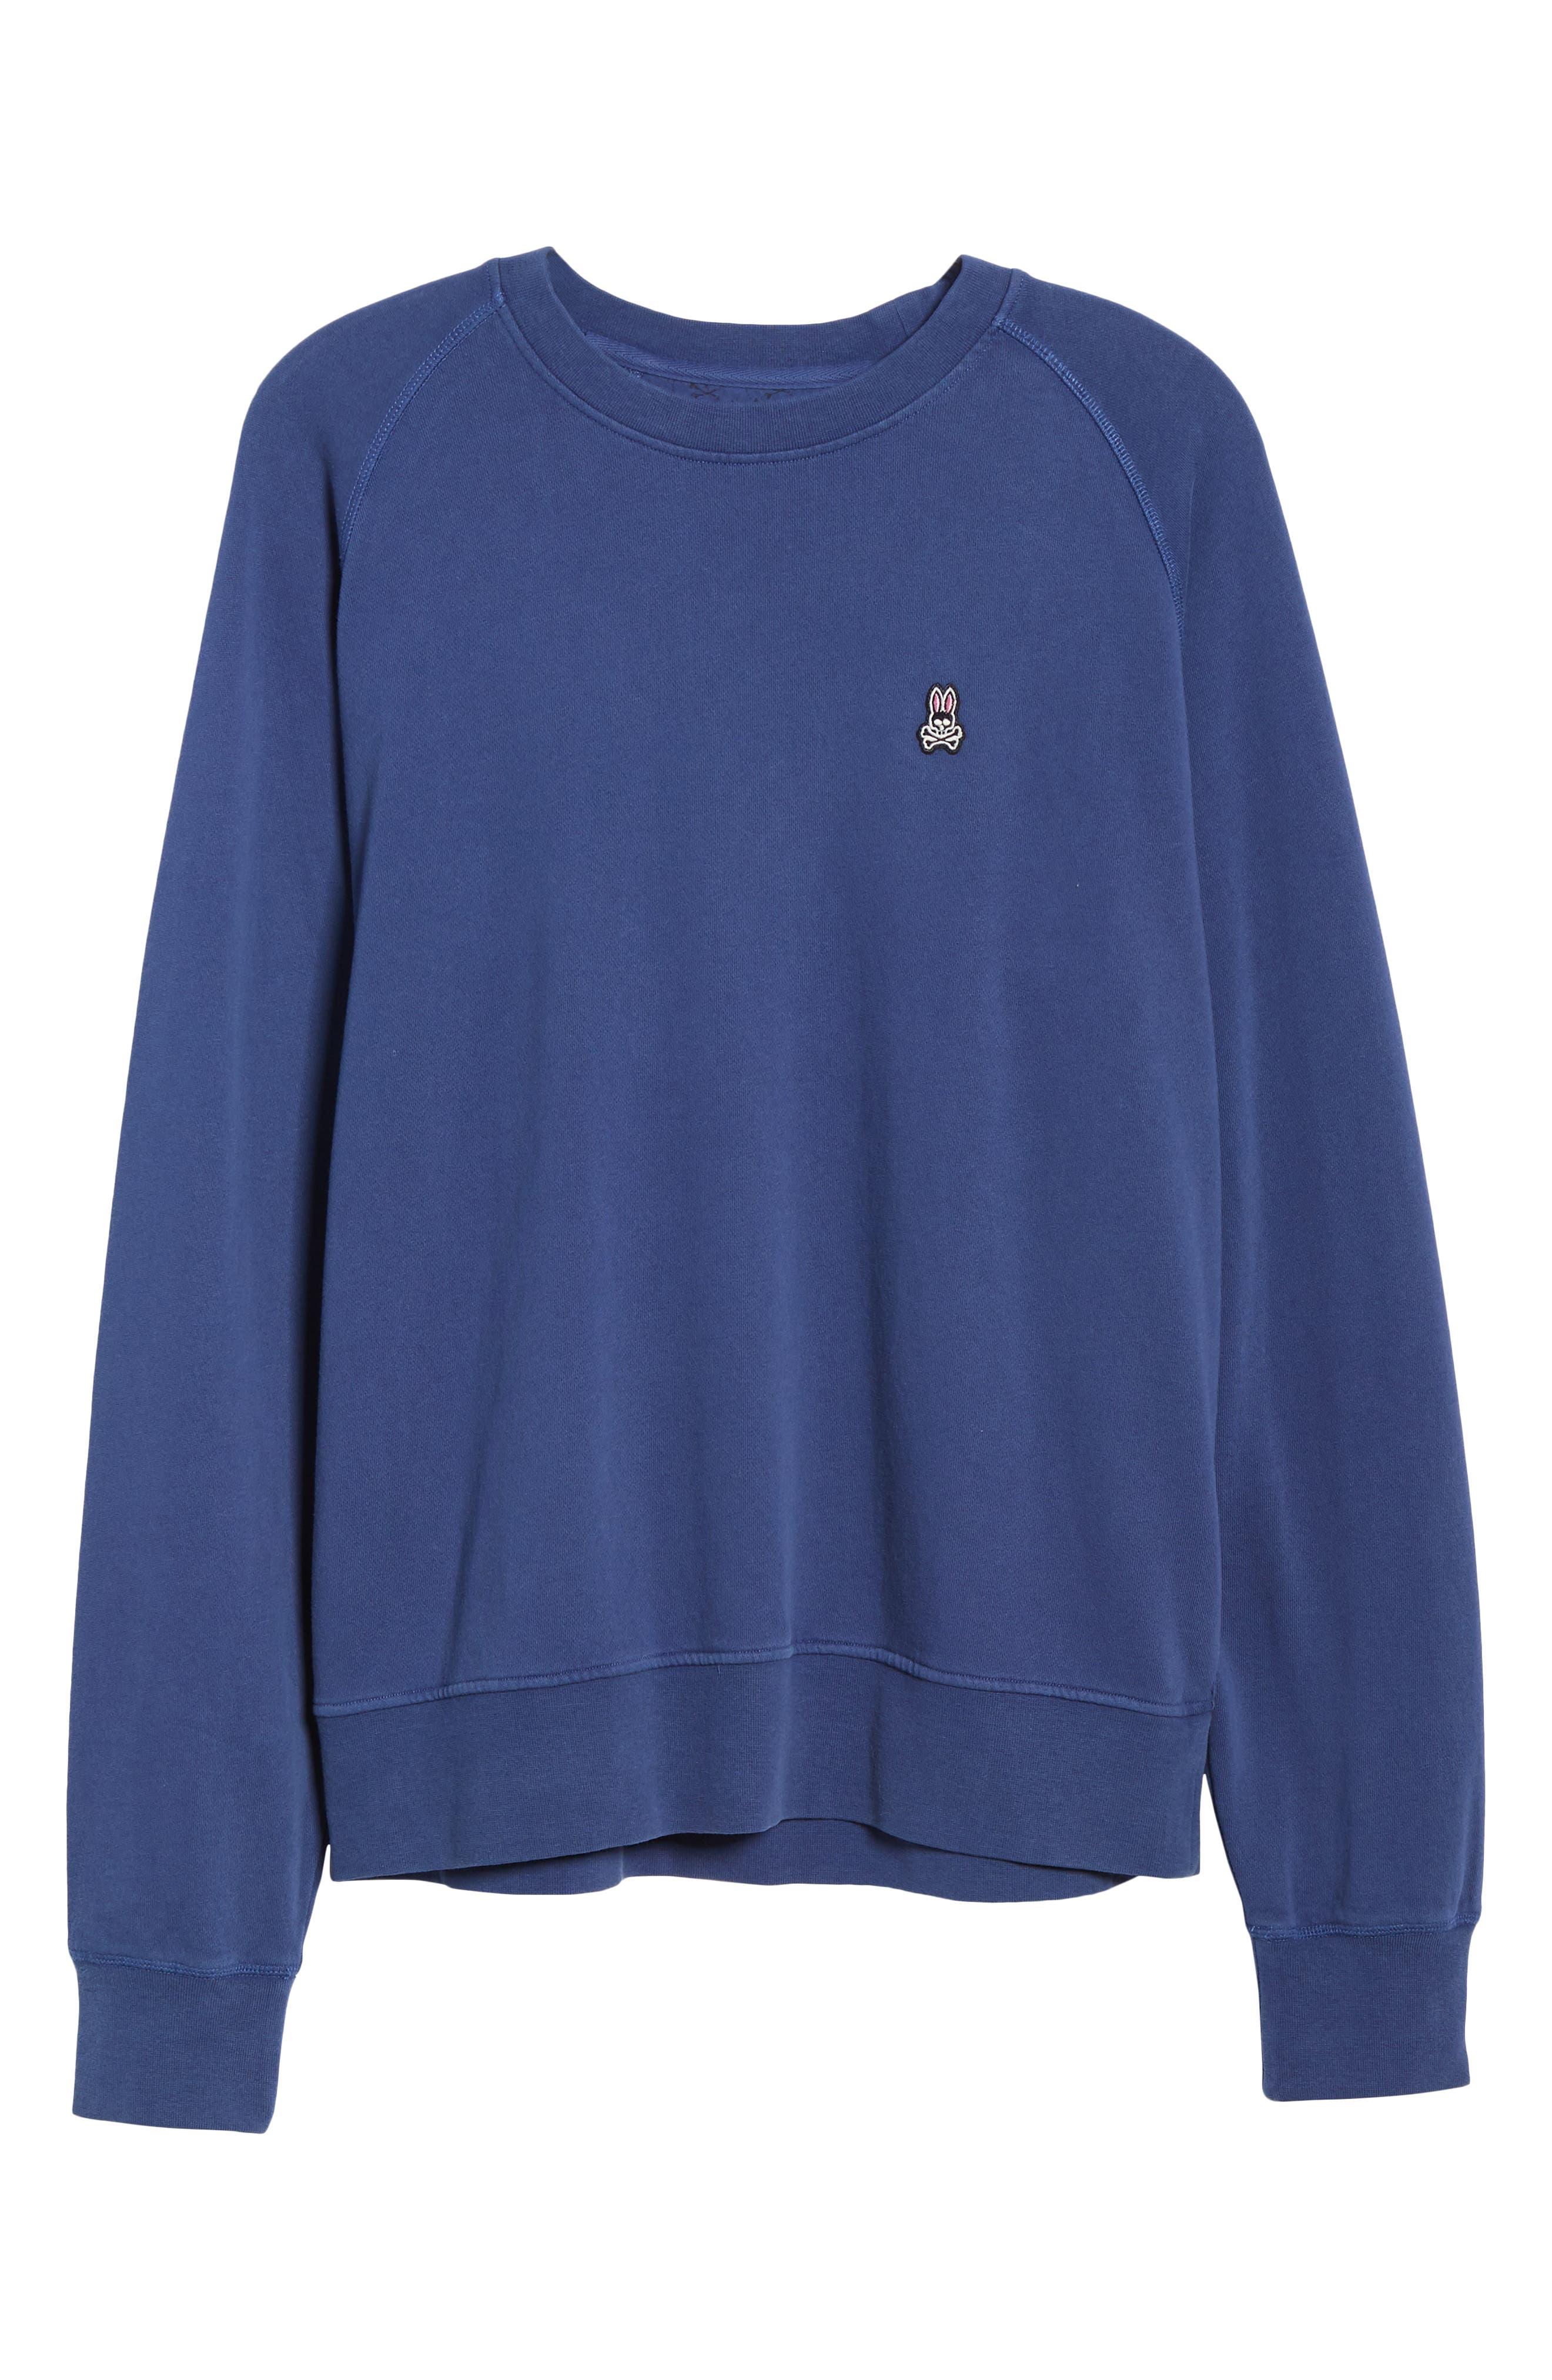 Dunham Crewneck Sweatshirt,                             Alternate thumbnail 6, color,                             BLUE PRINT